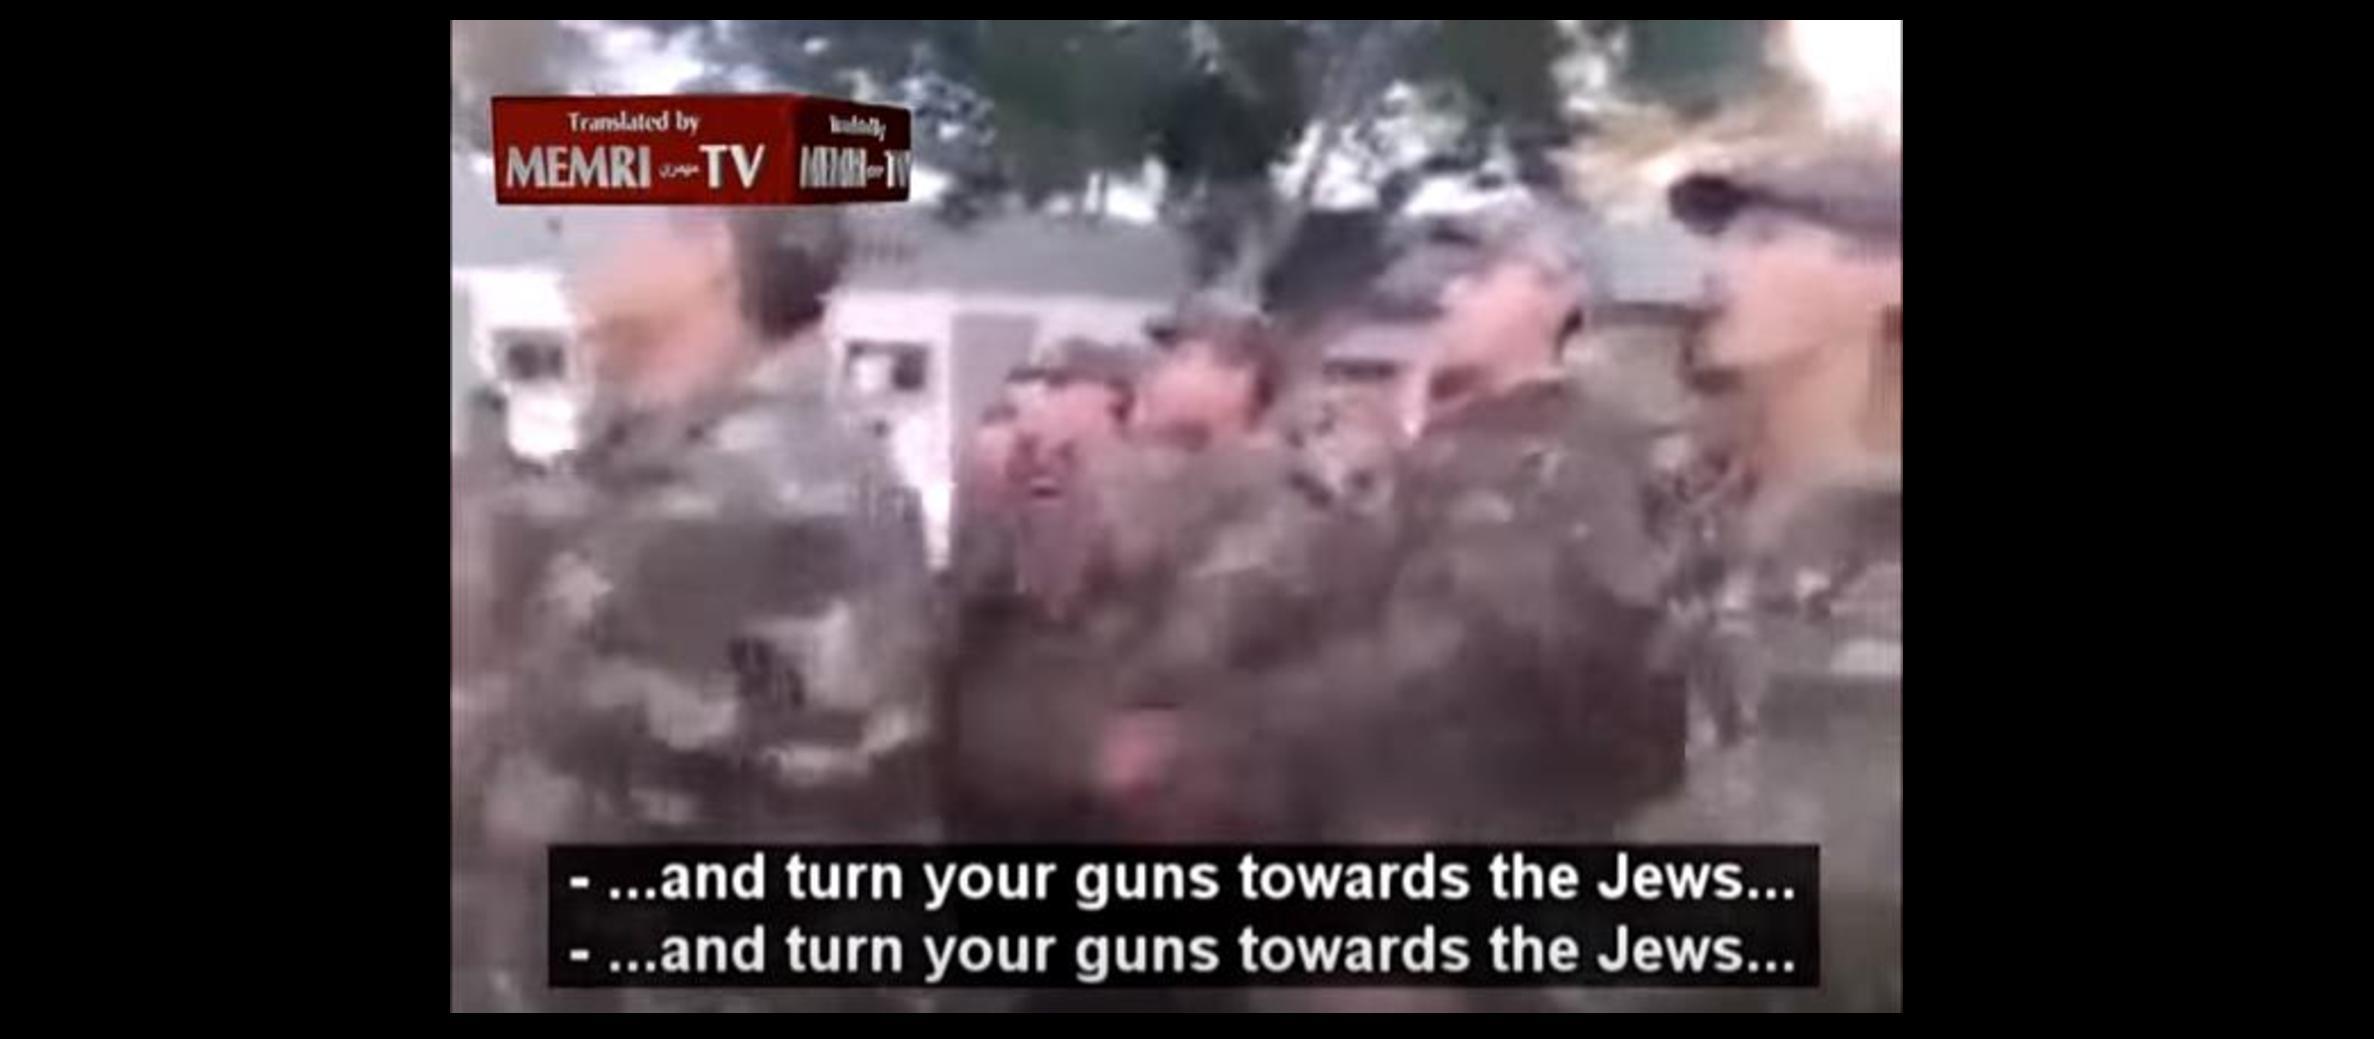 WATCH: Algerian troops march singing 'kill the Jews'